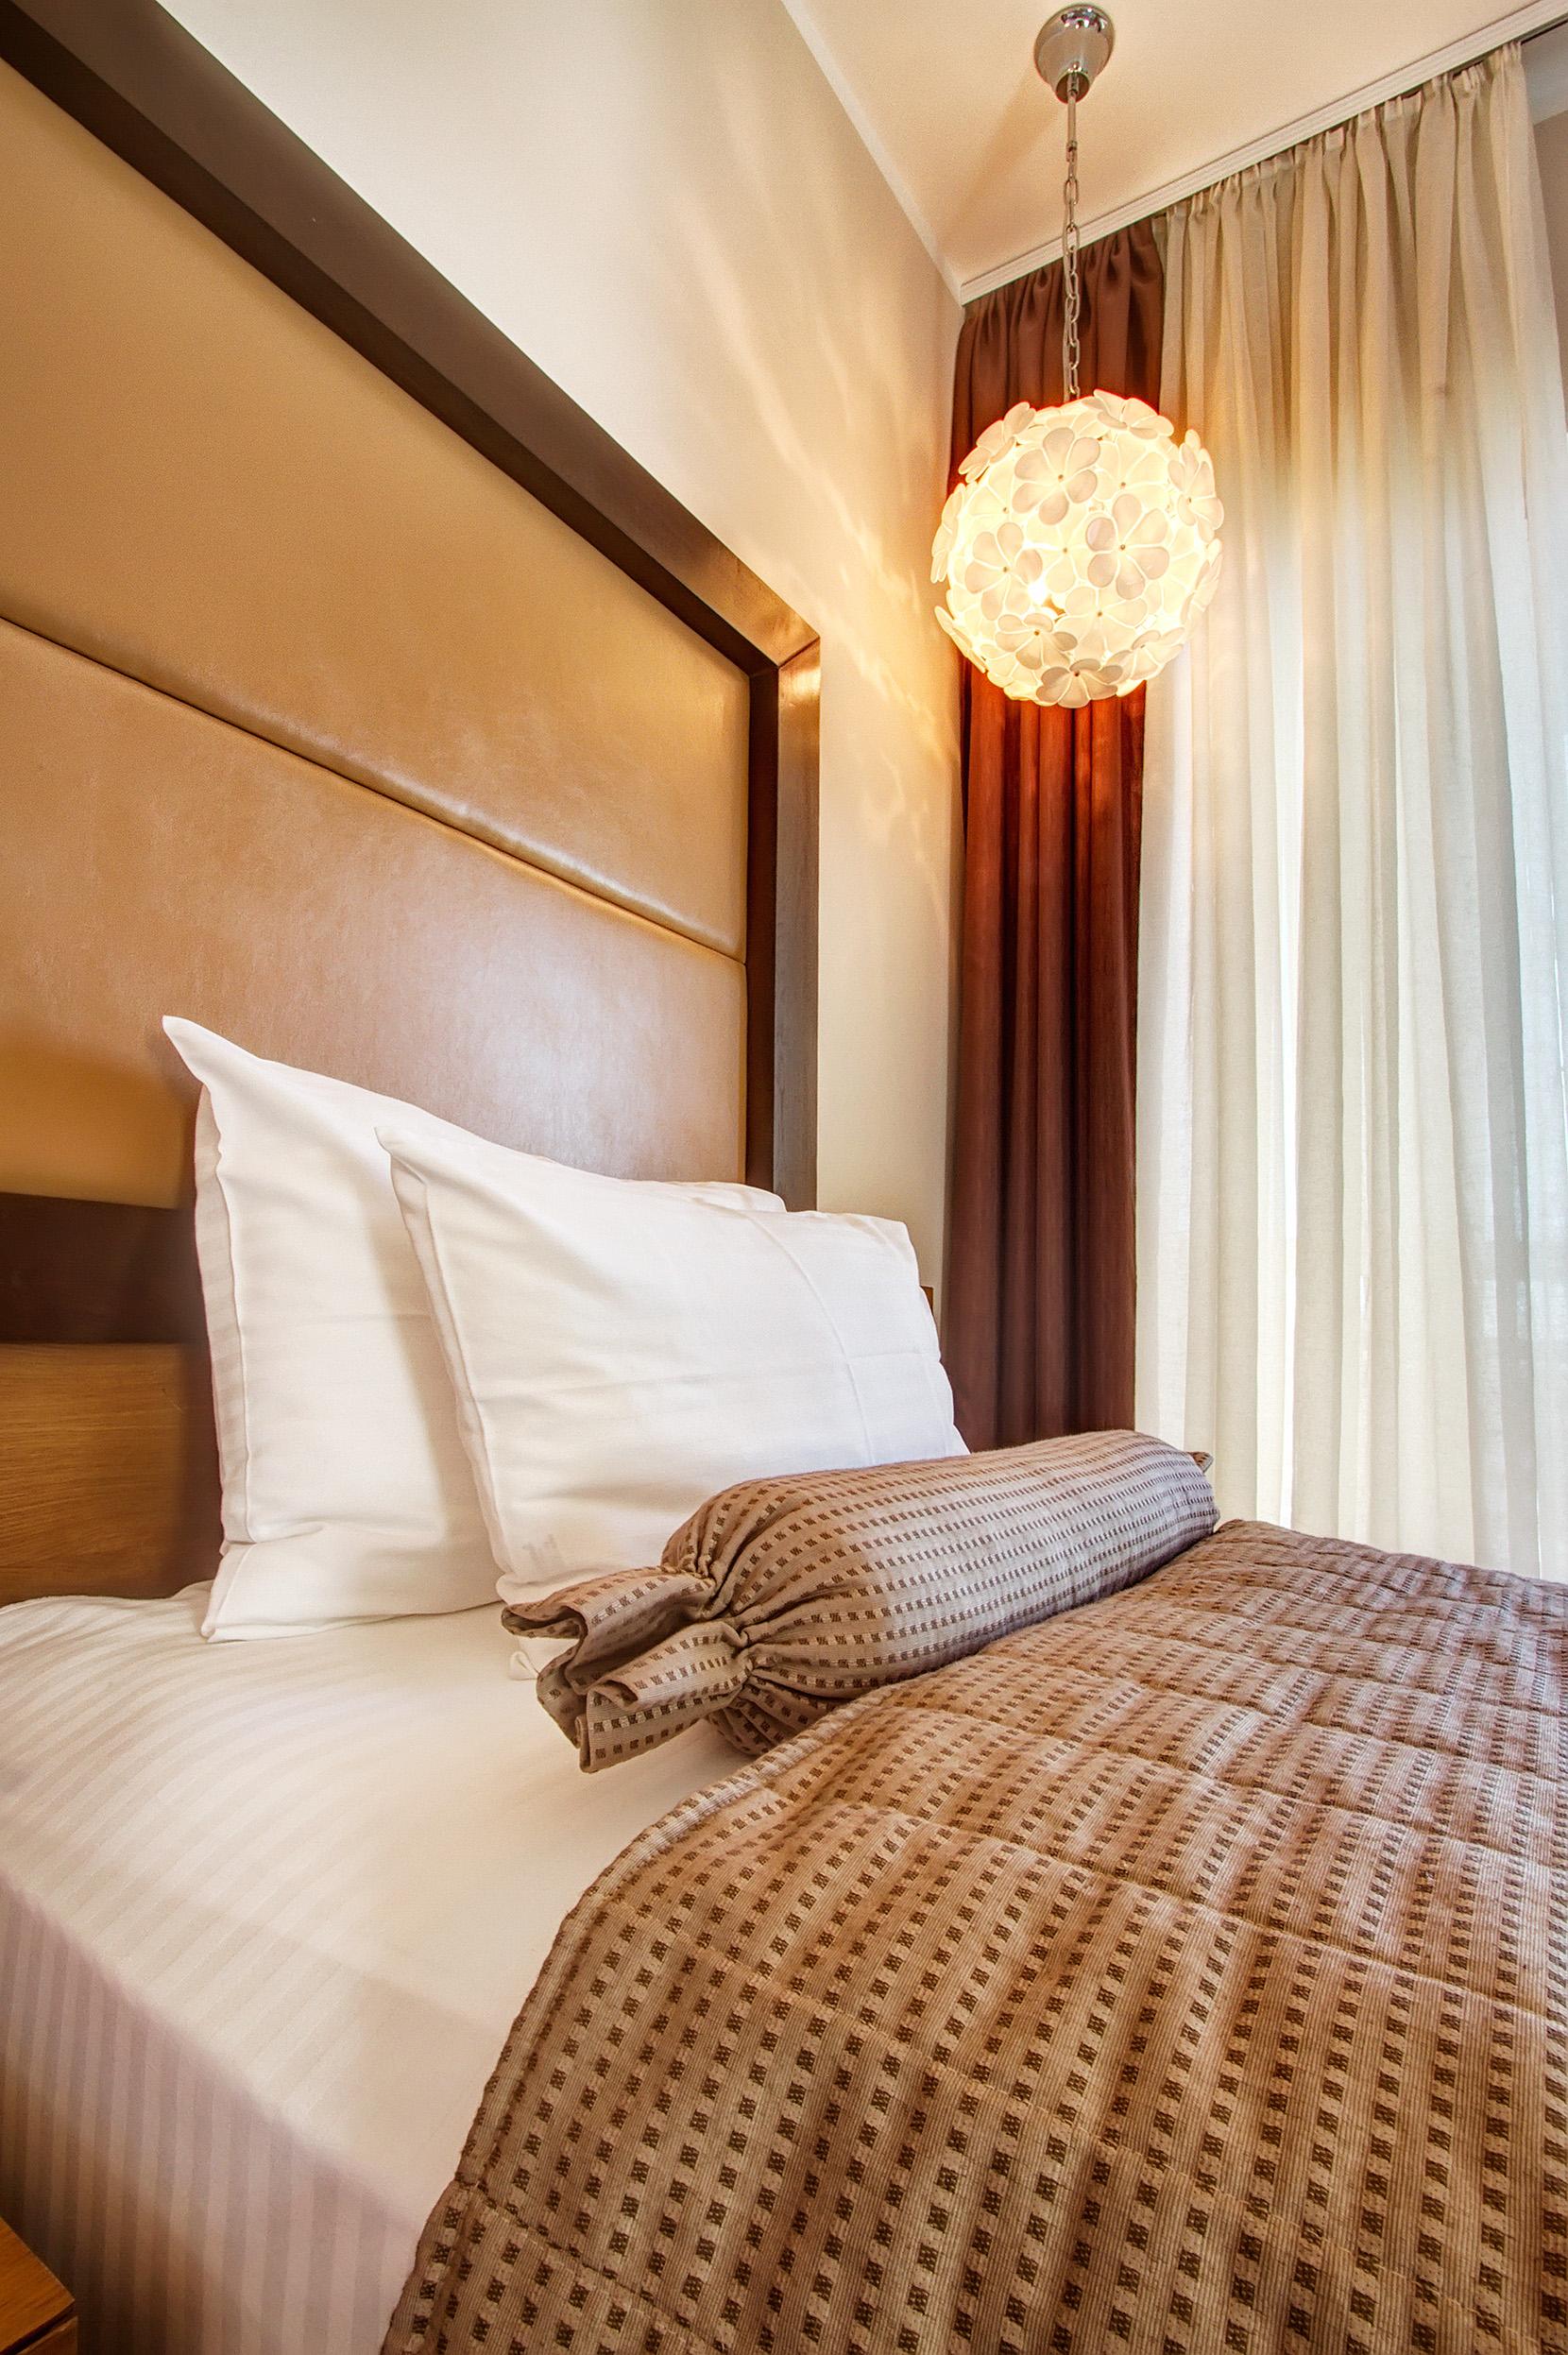 Zlatibor, smestaj, letnji odmor, spavanje, pansion, spa, soba, apartman, akcija, nova godina, hotel mir 23